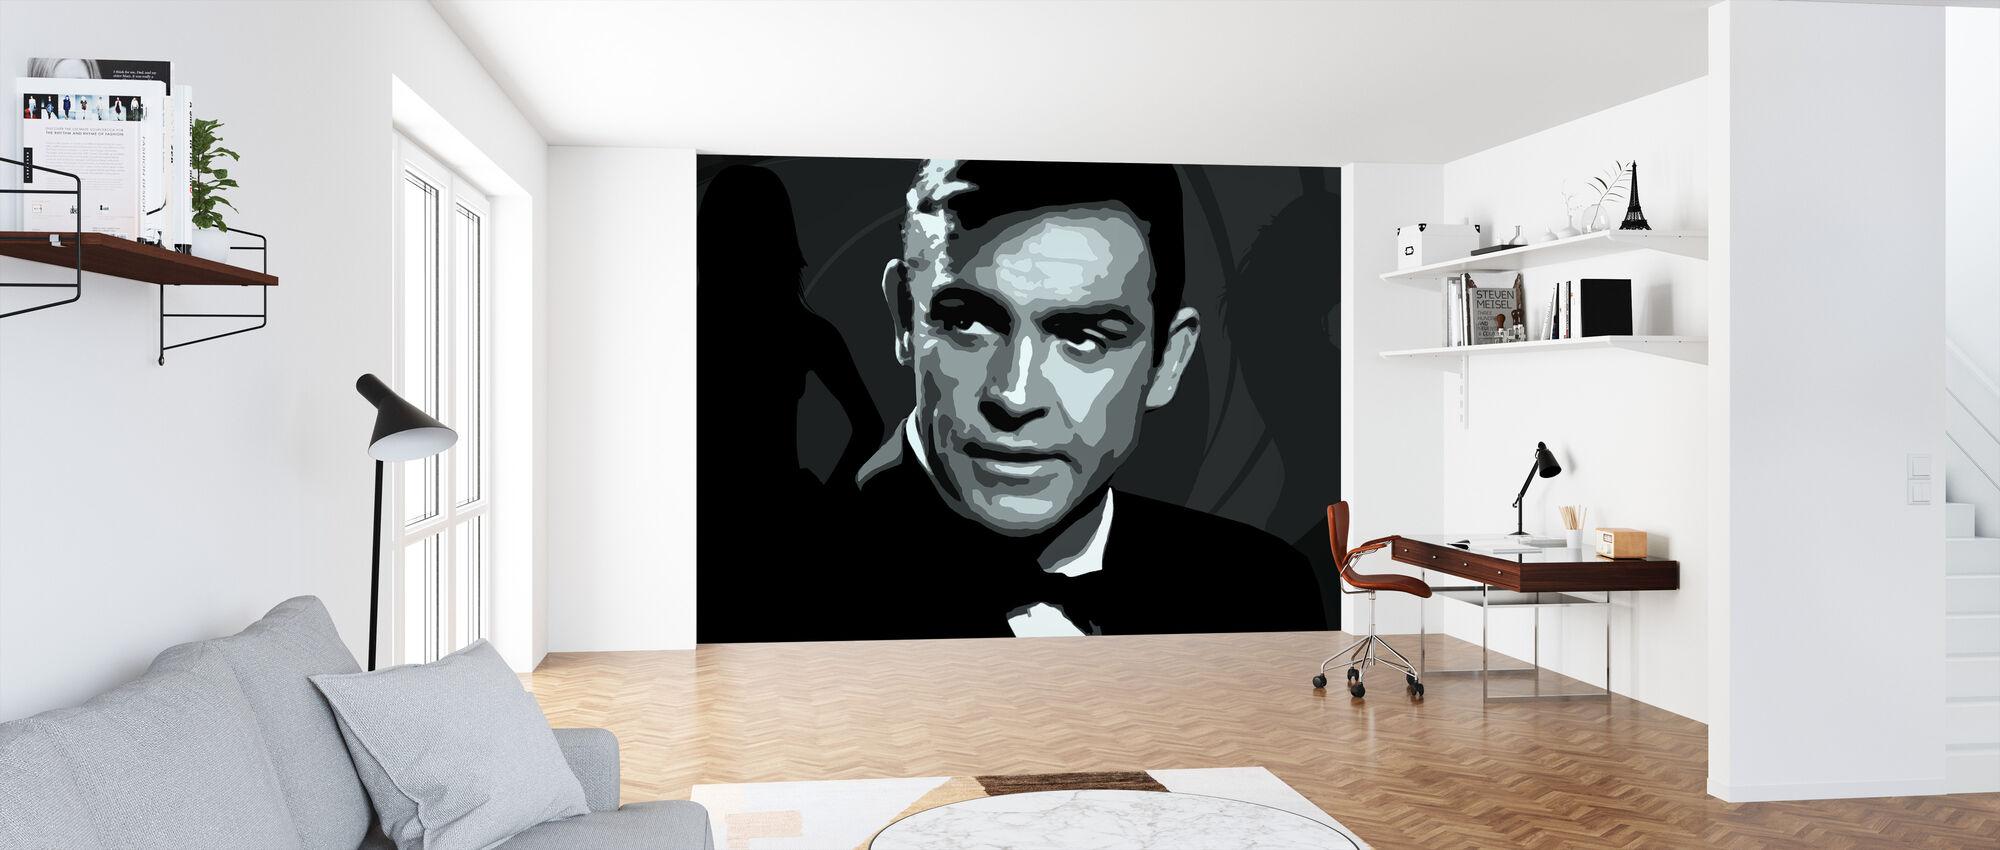 Bond - Wallpaper - Office